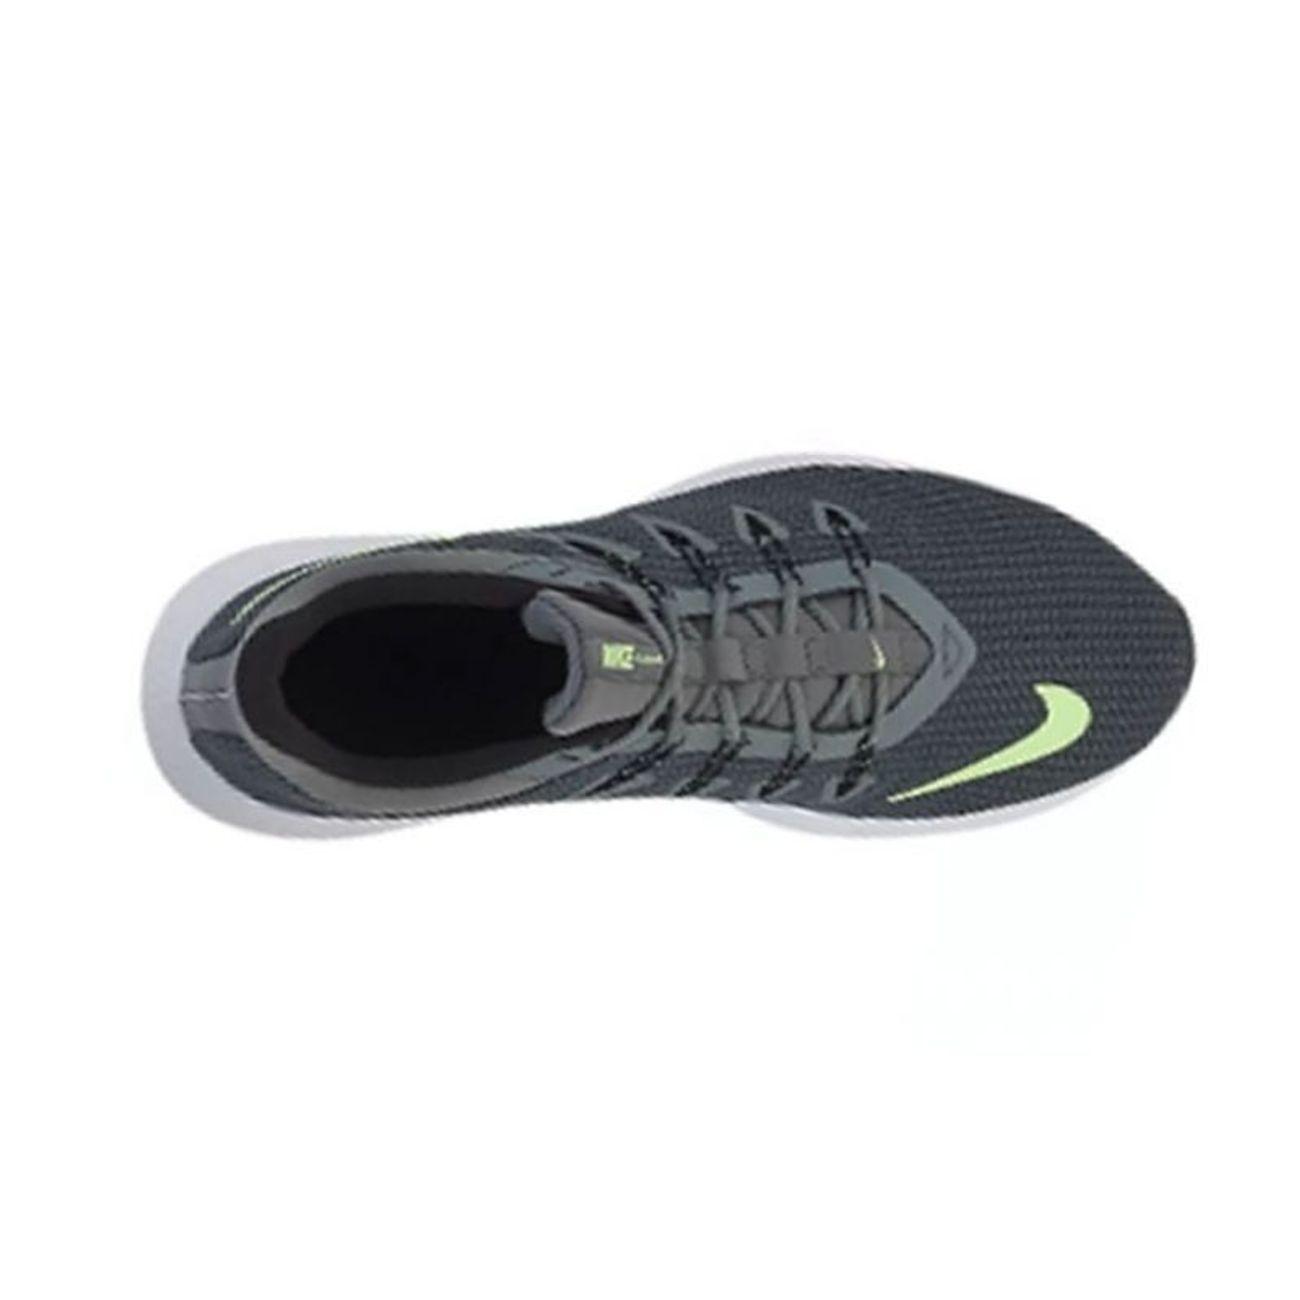 Padel Gris Adulte 007 Nike Oscuro Niaa7403 Quest F3TlKuJc1